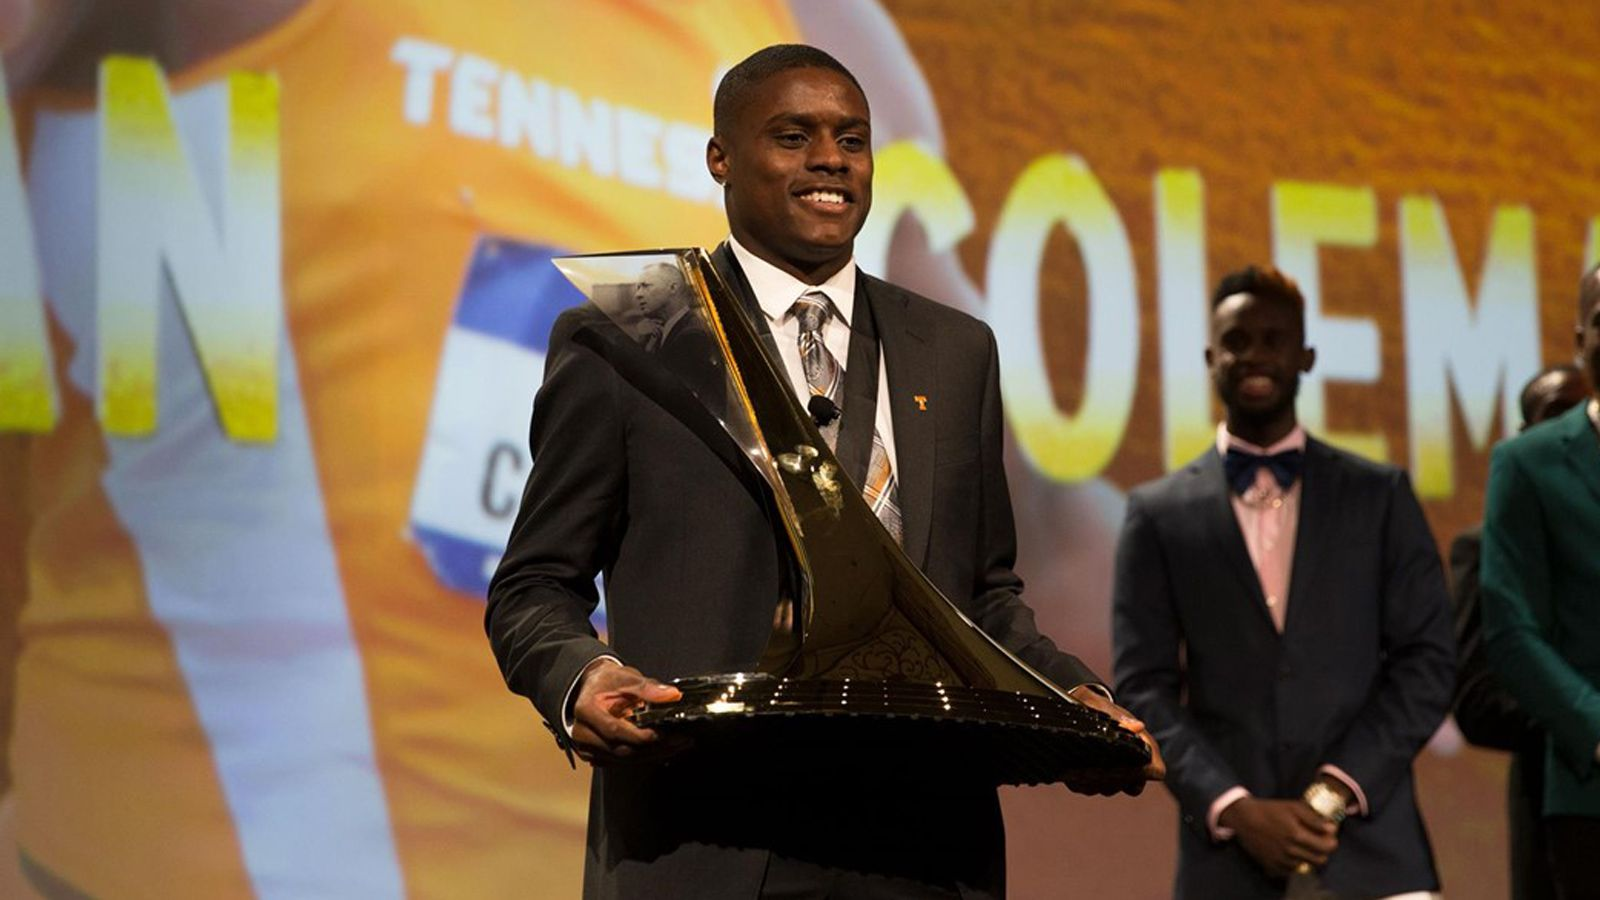 Tennessee's Coleman wins 2017 Bowerman Award